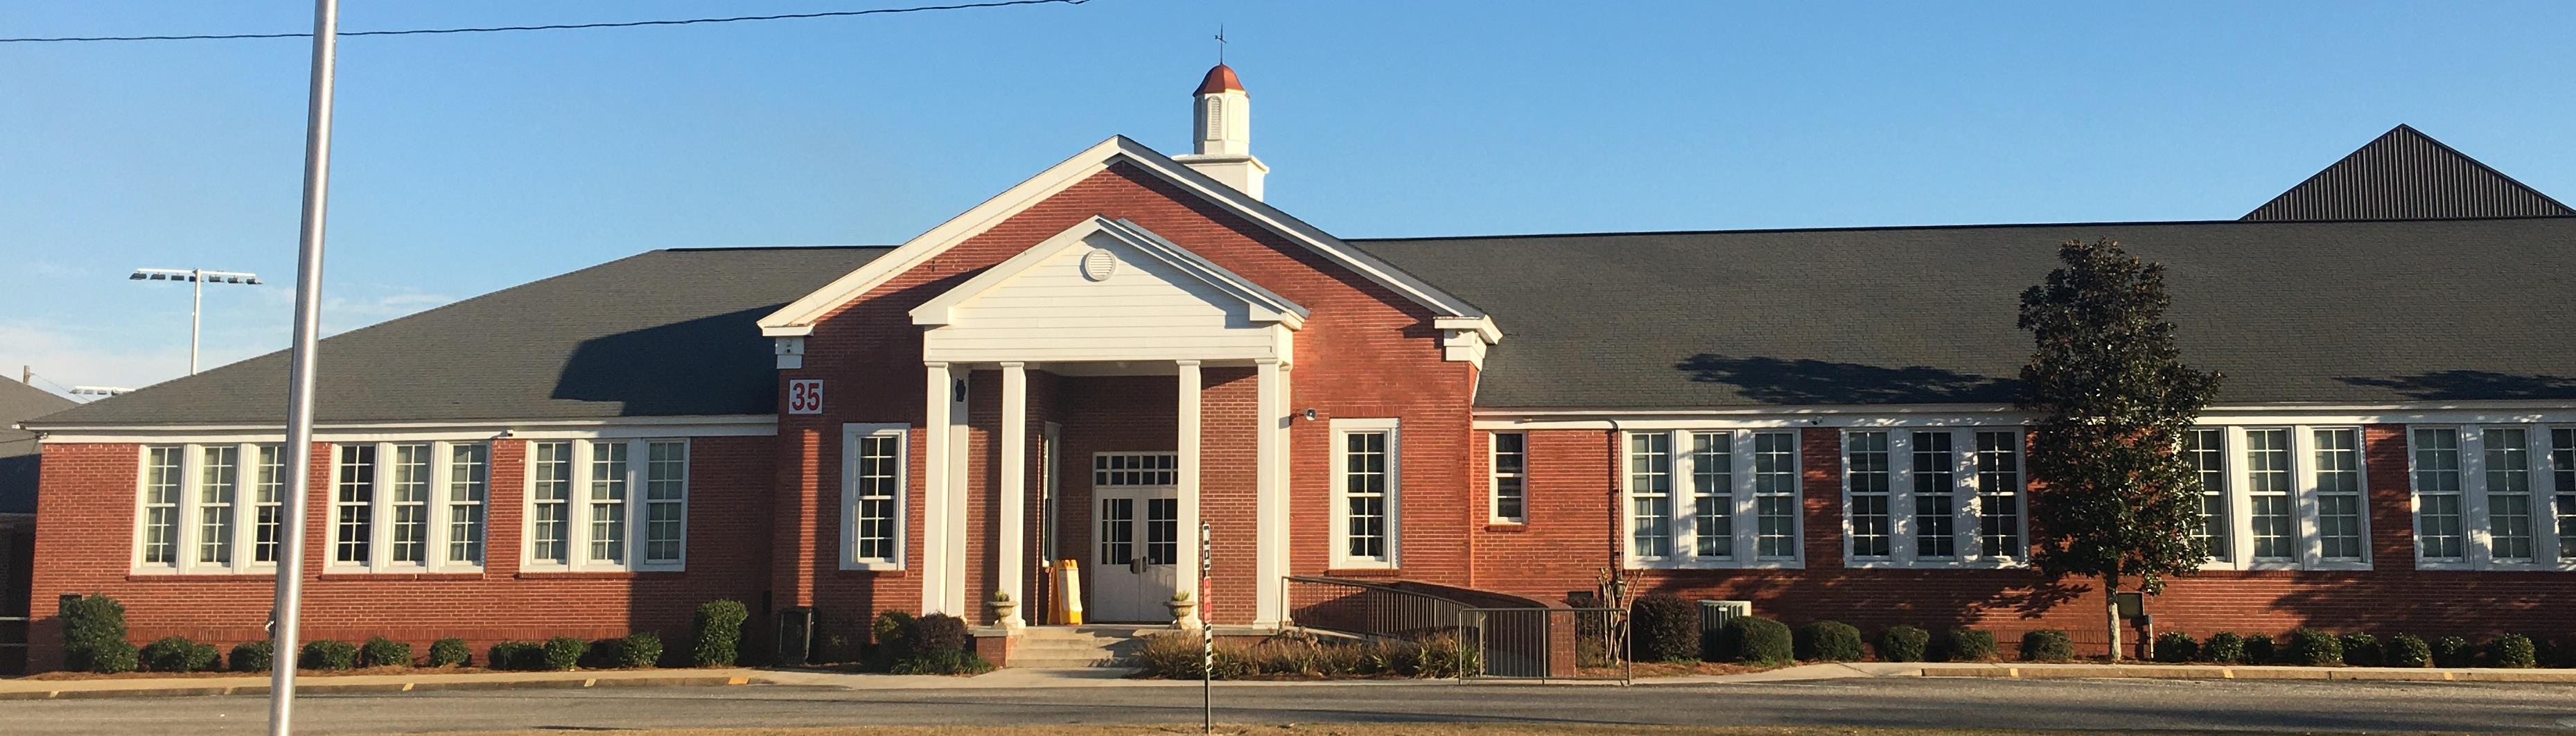 Zion Chapel High School Main Building